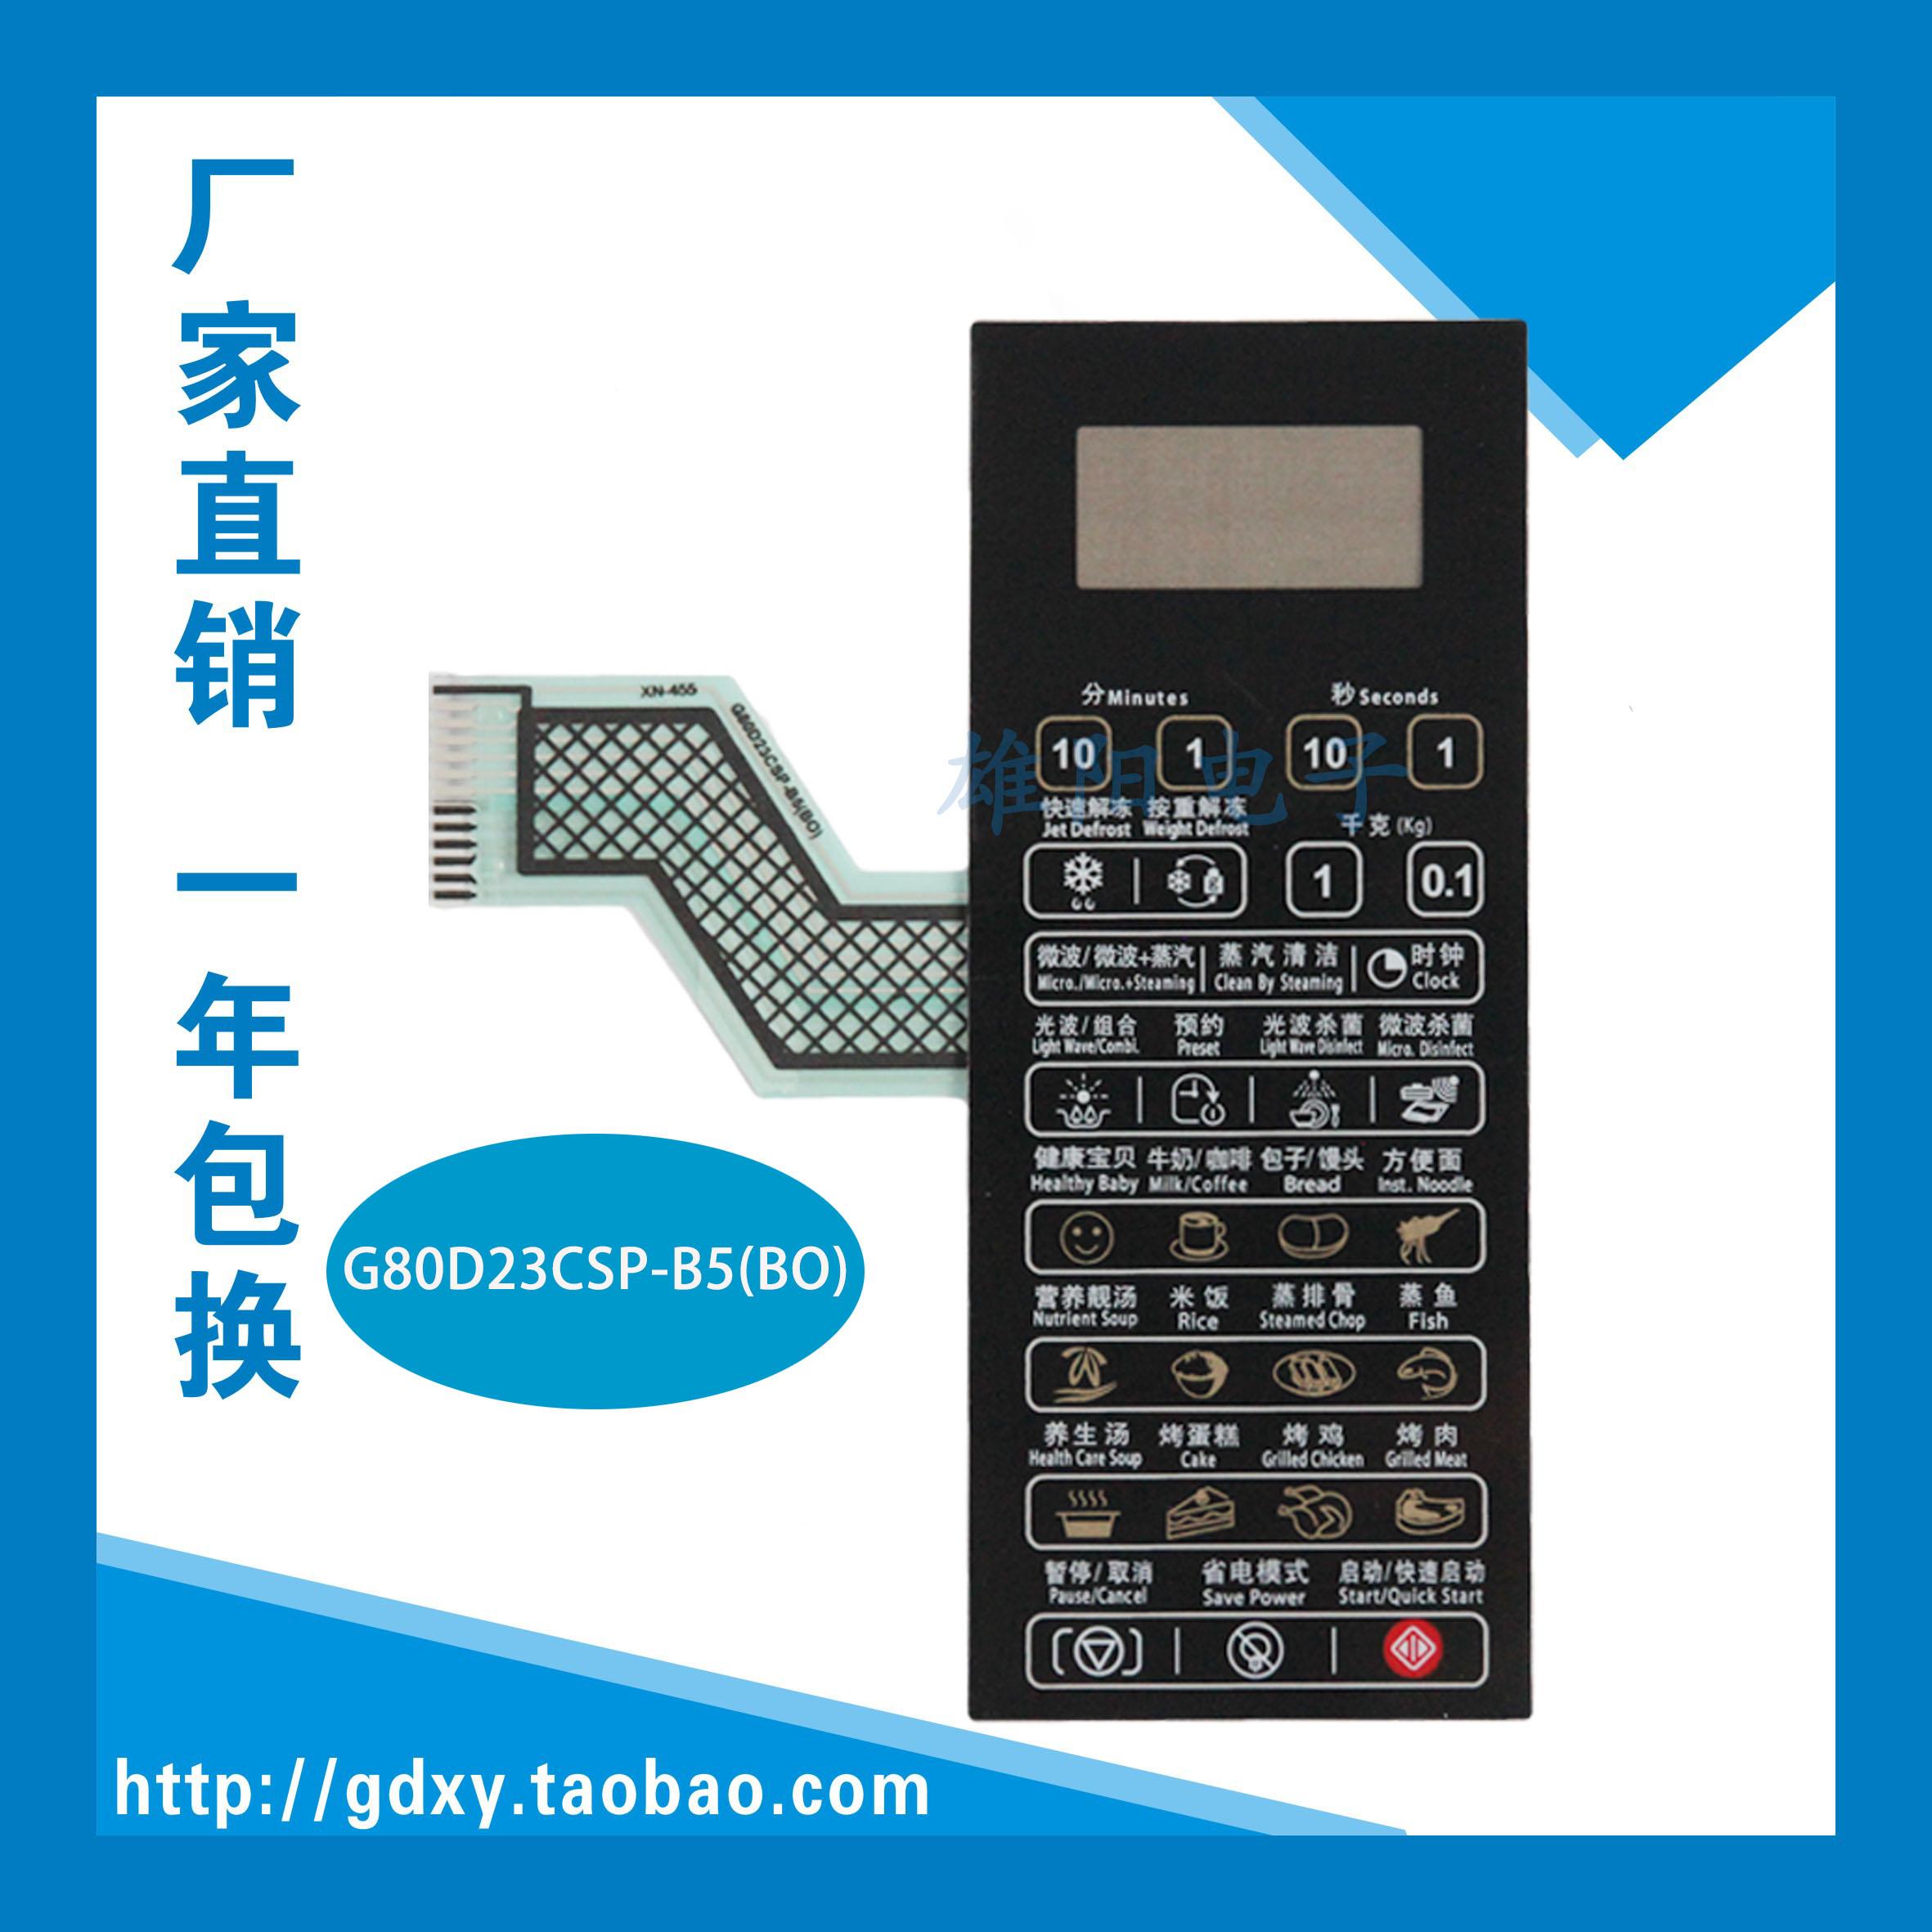 Painel de membrana interruptor de G80D23CN2P-B5 Glanz, forno de Microondas G80D23CSP-B5 botão colar (Bo)